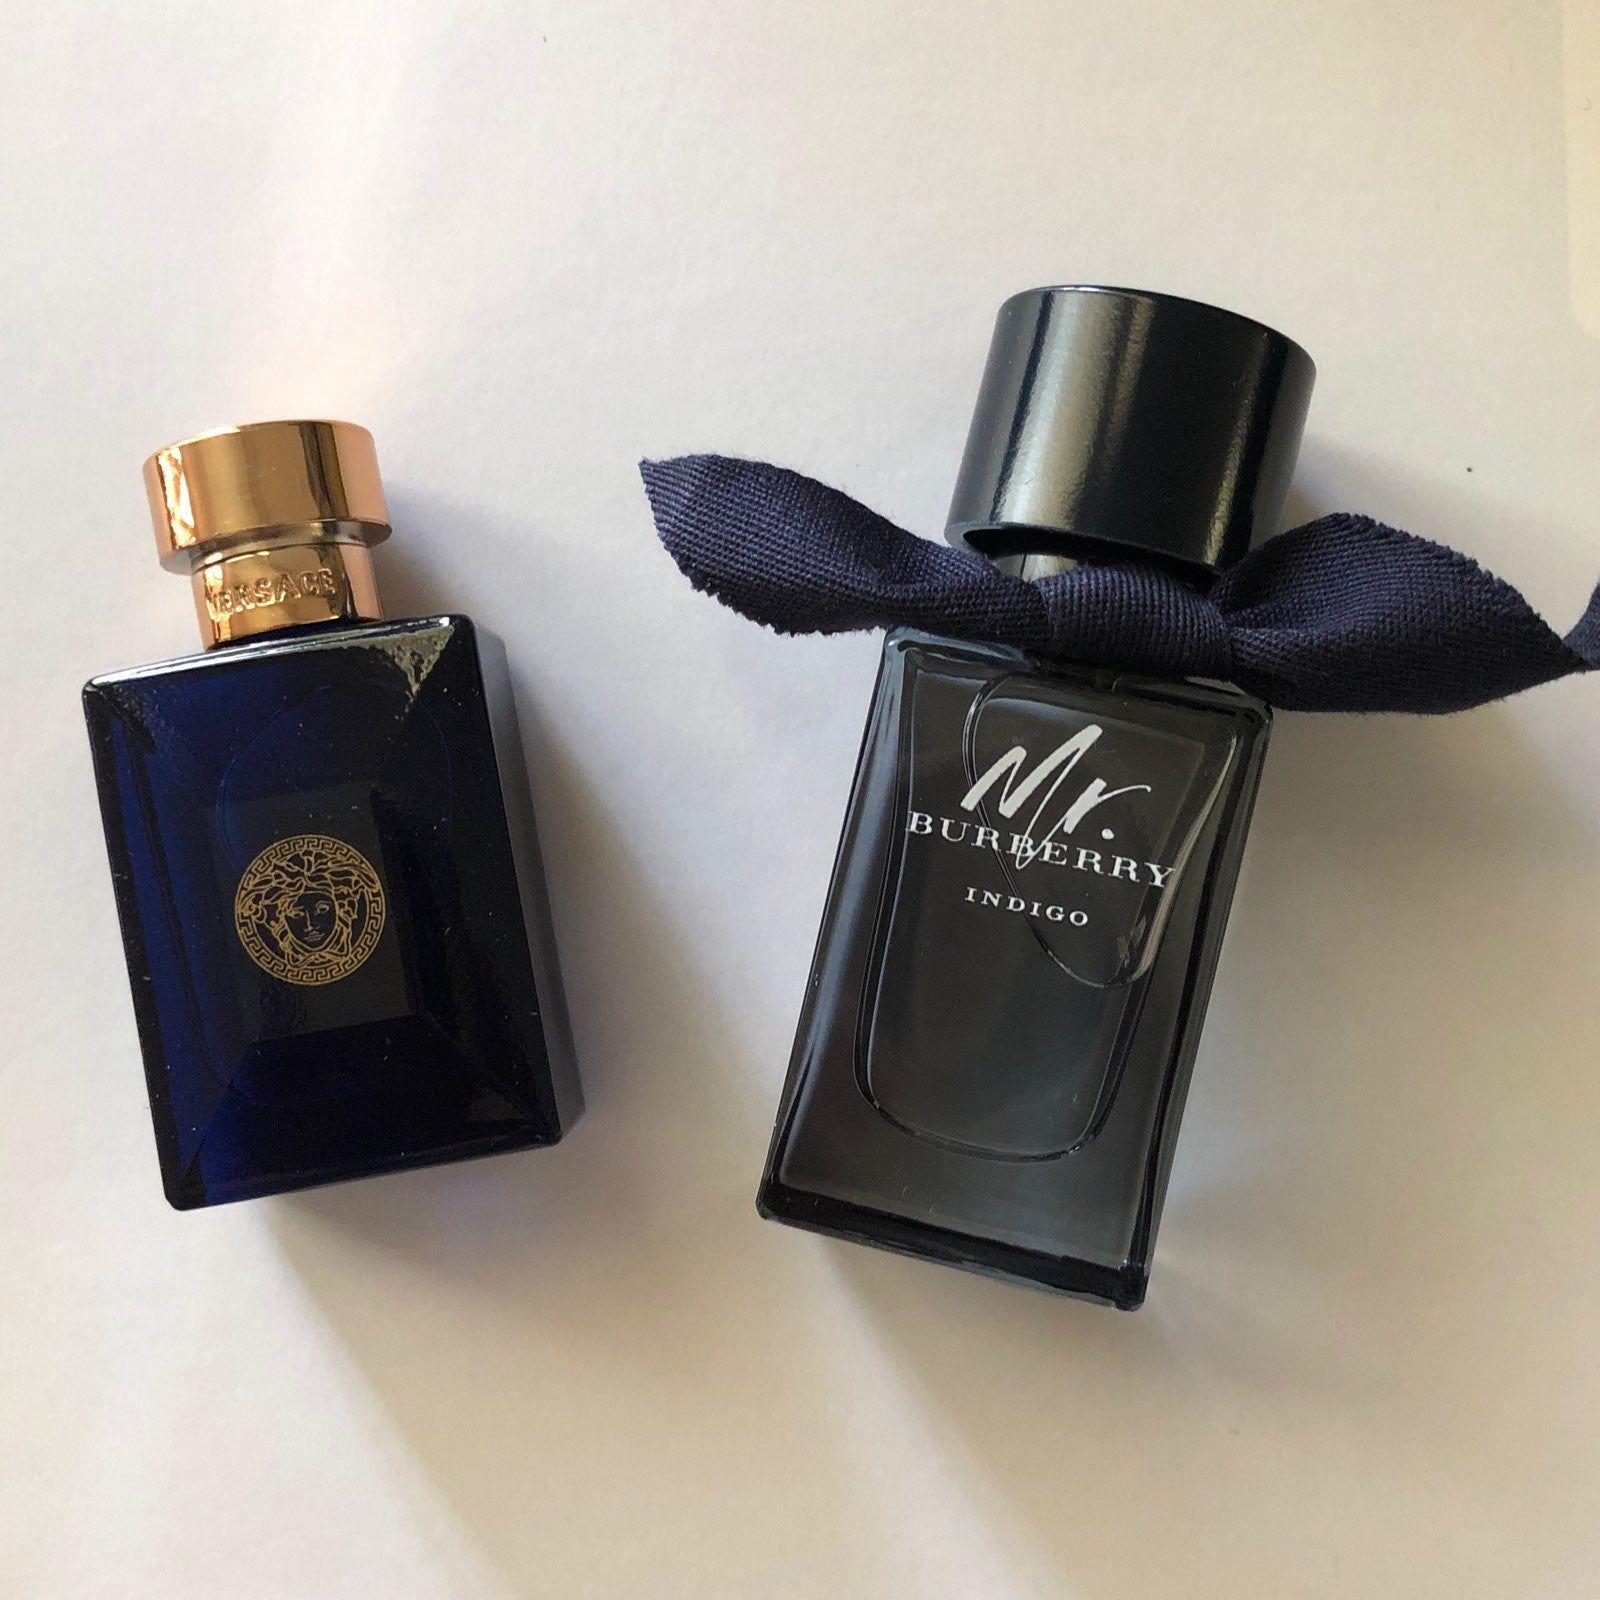 Burberry My Burberry Indigo Versace Pour Homme Dylan Blue New Travel Splash Bottle 5ml Each Men Perfume Perfume Set Perfume